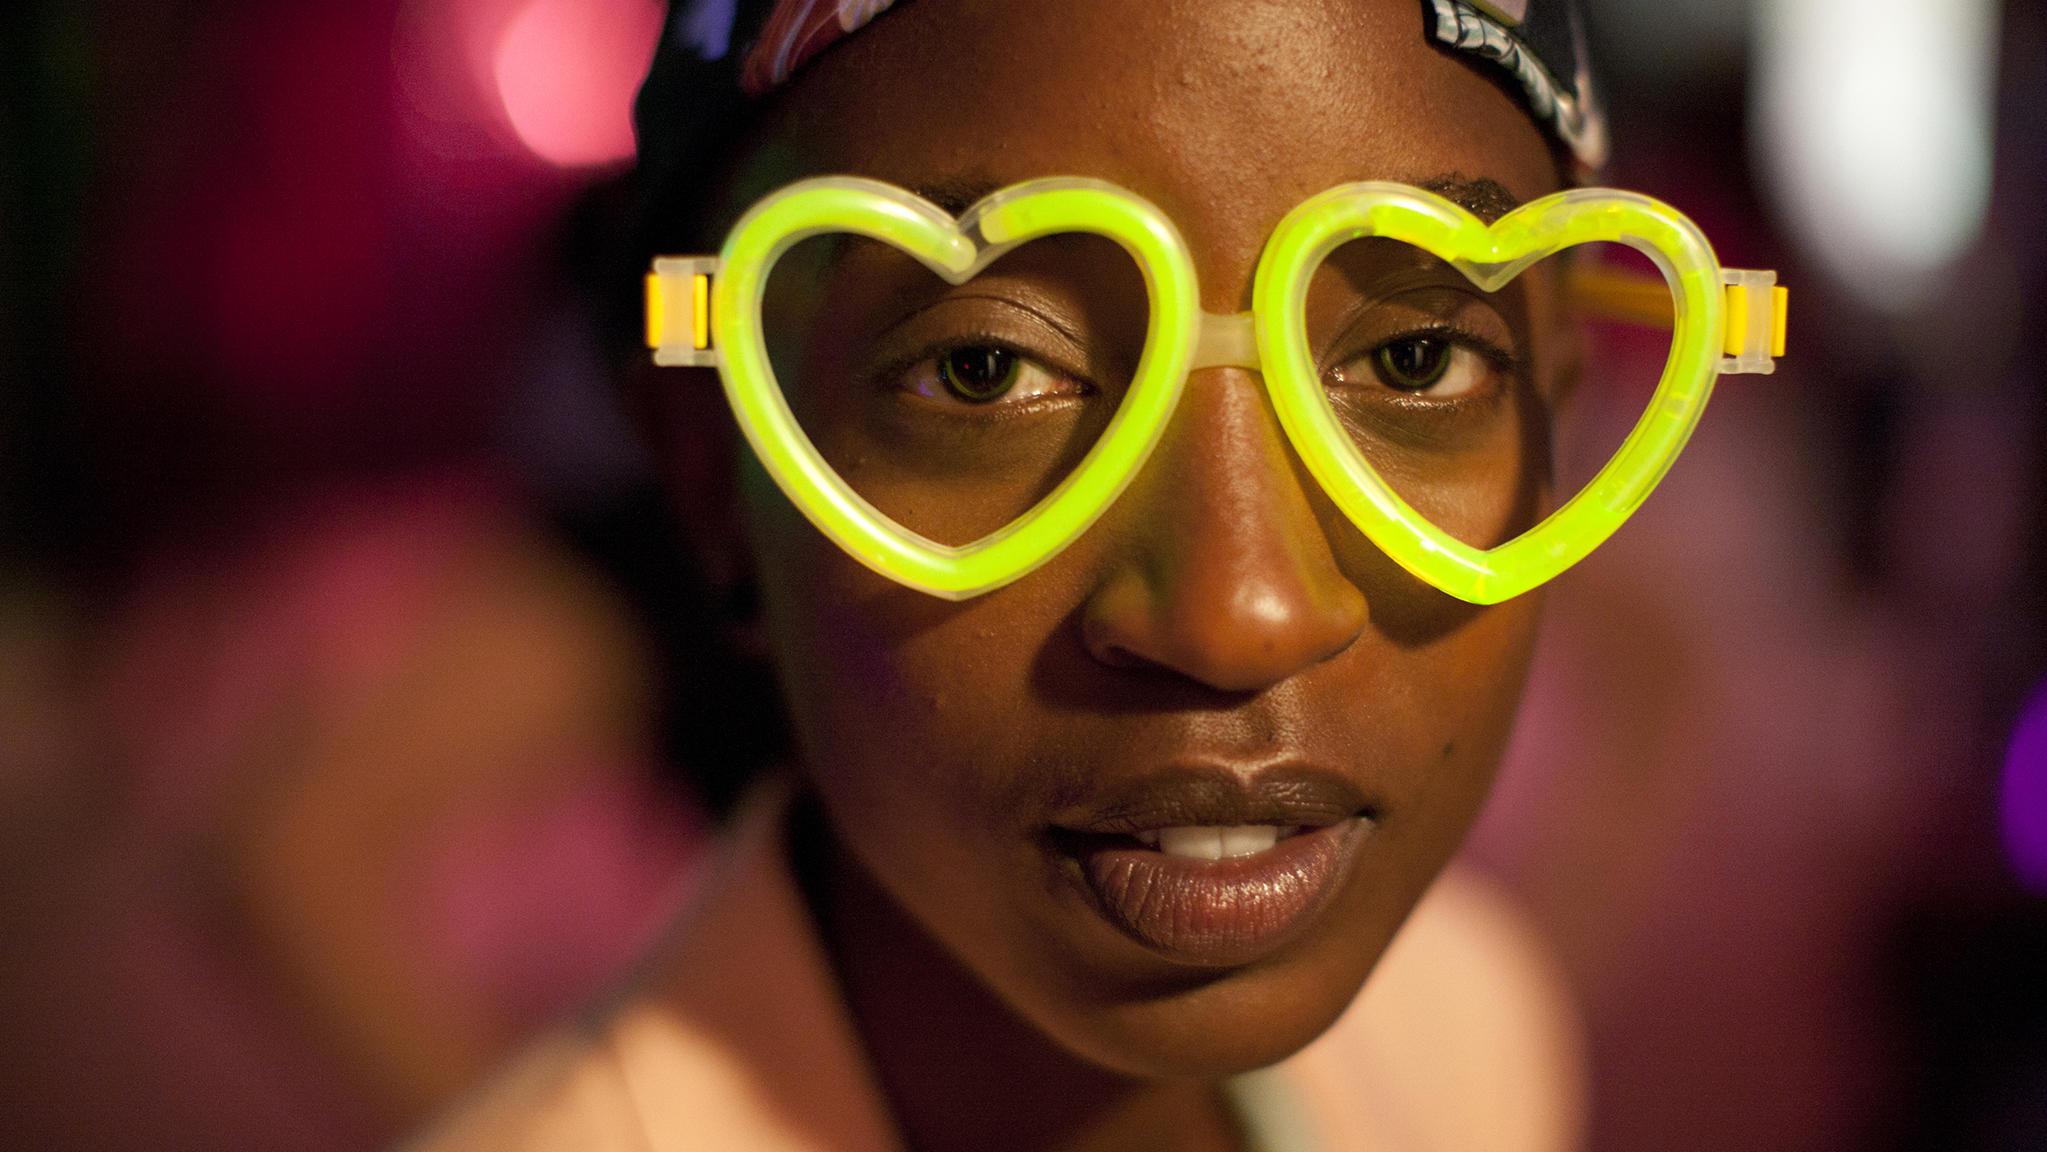 Guia de filmes africanos para ver durante o isolamento social